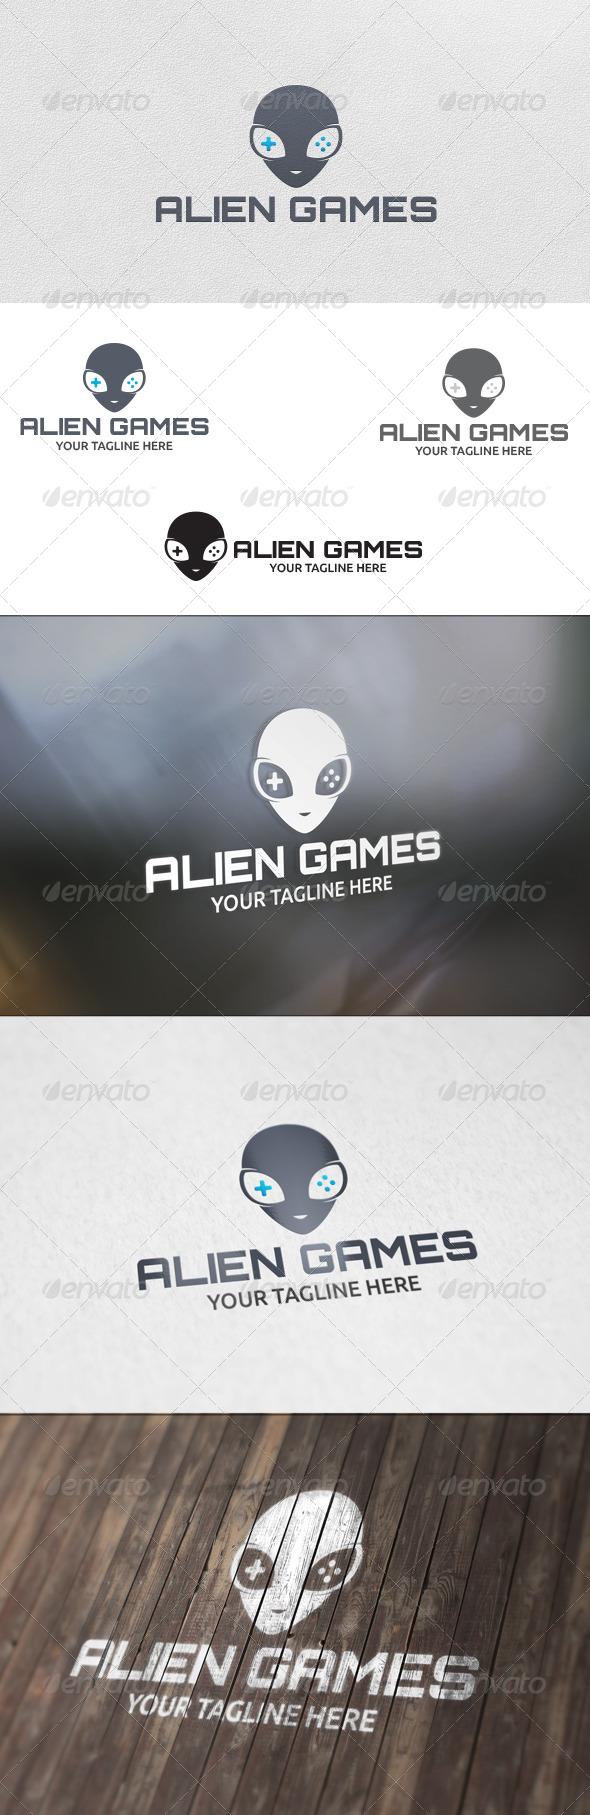 Alien Games - Logo Template